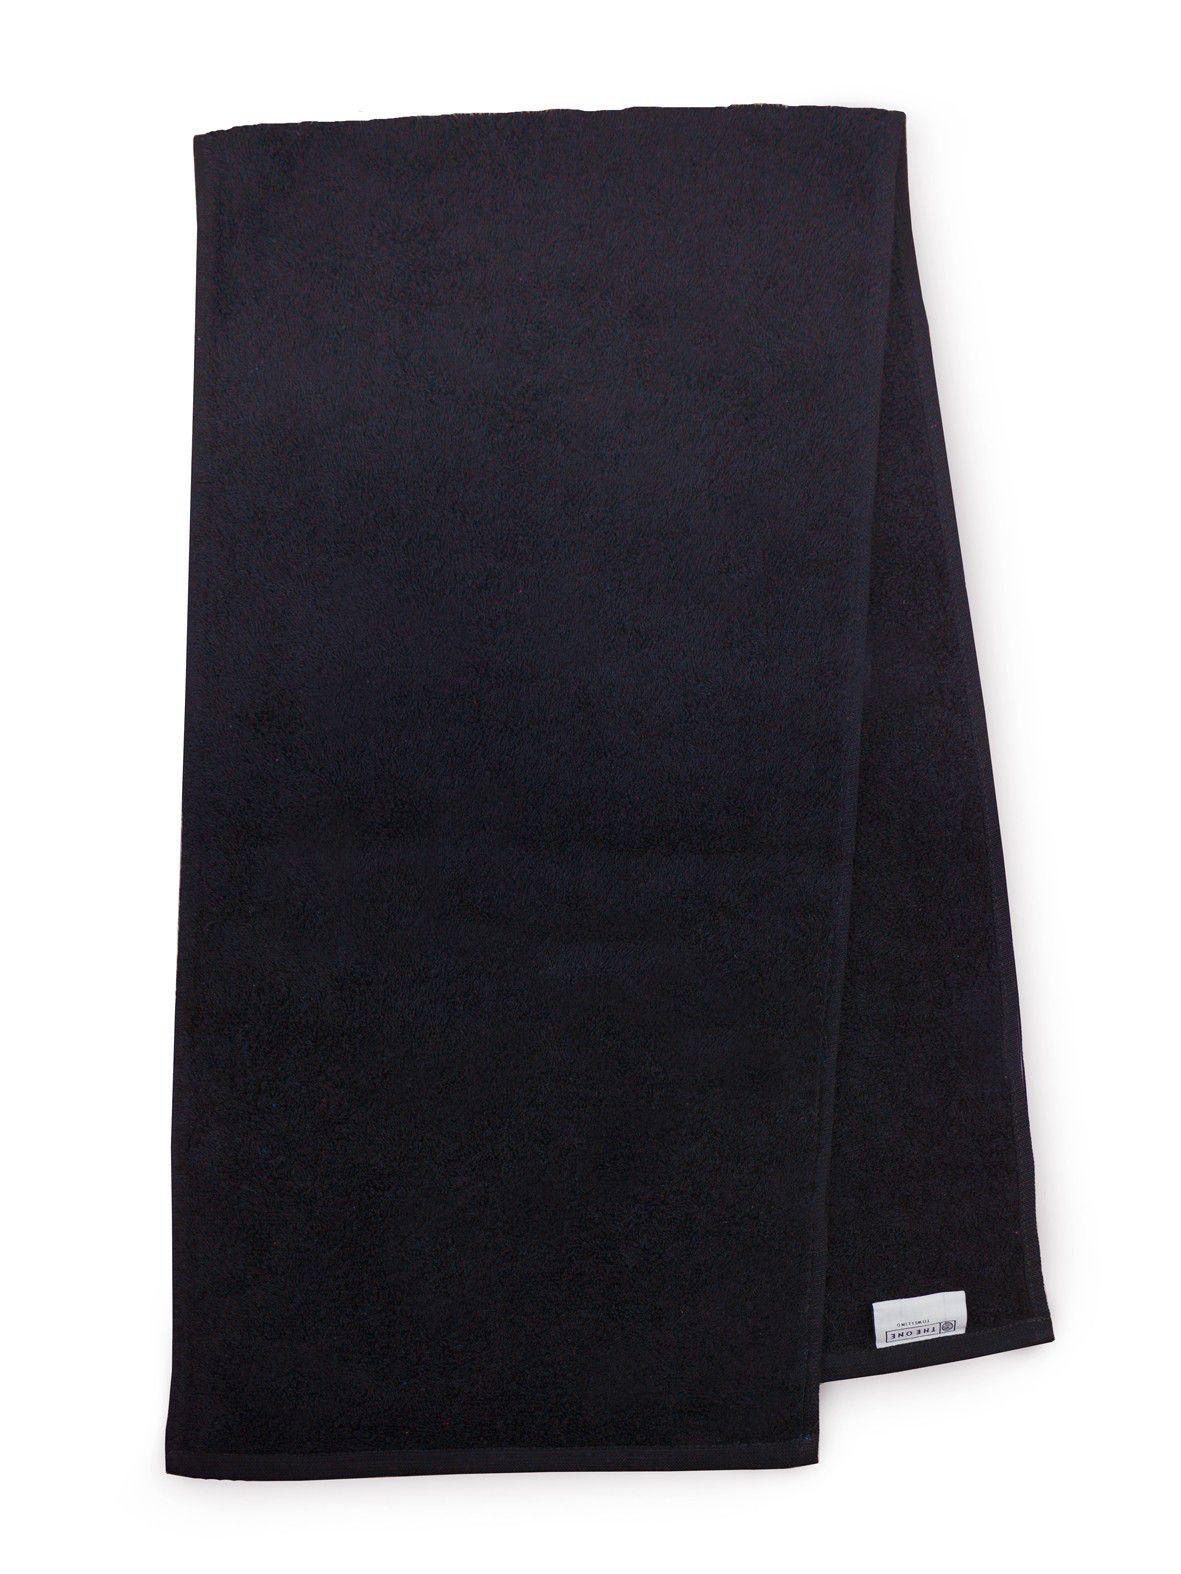 The One Sporthanddoek 450 gram Zwart